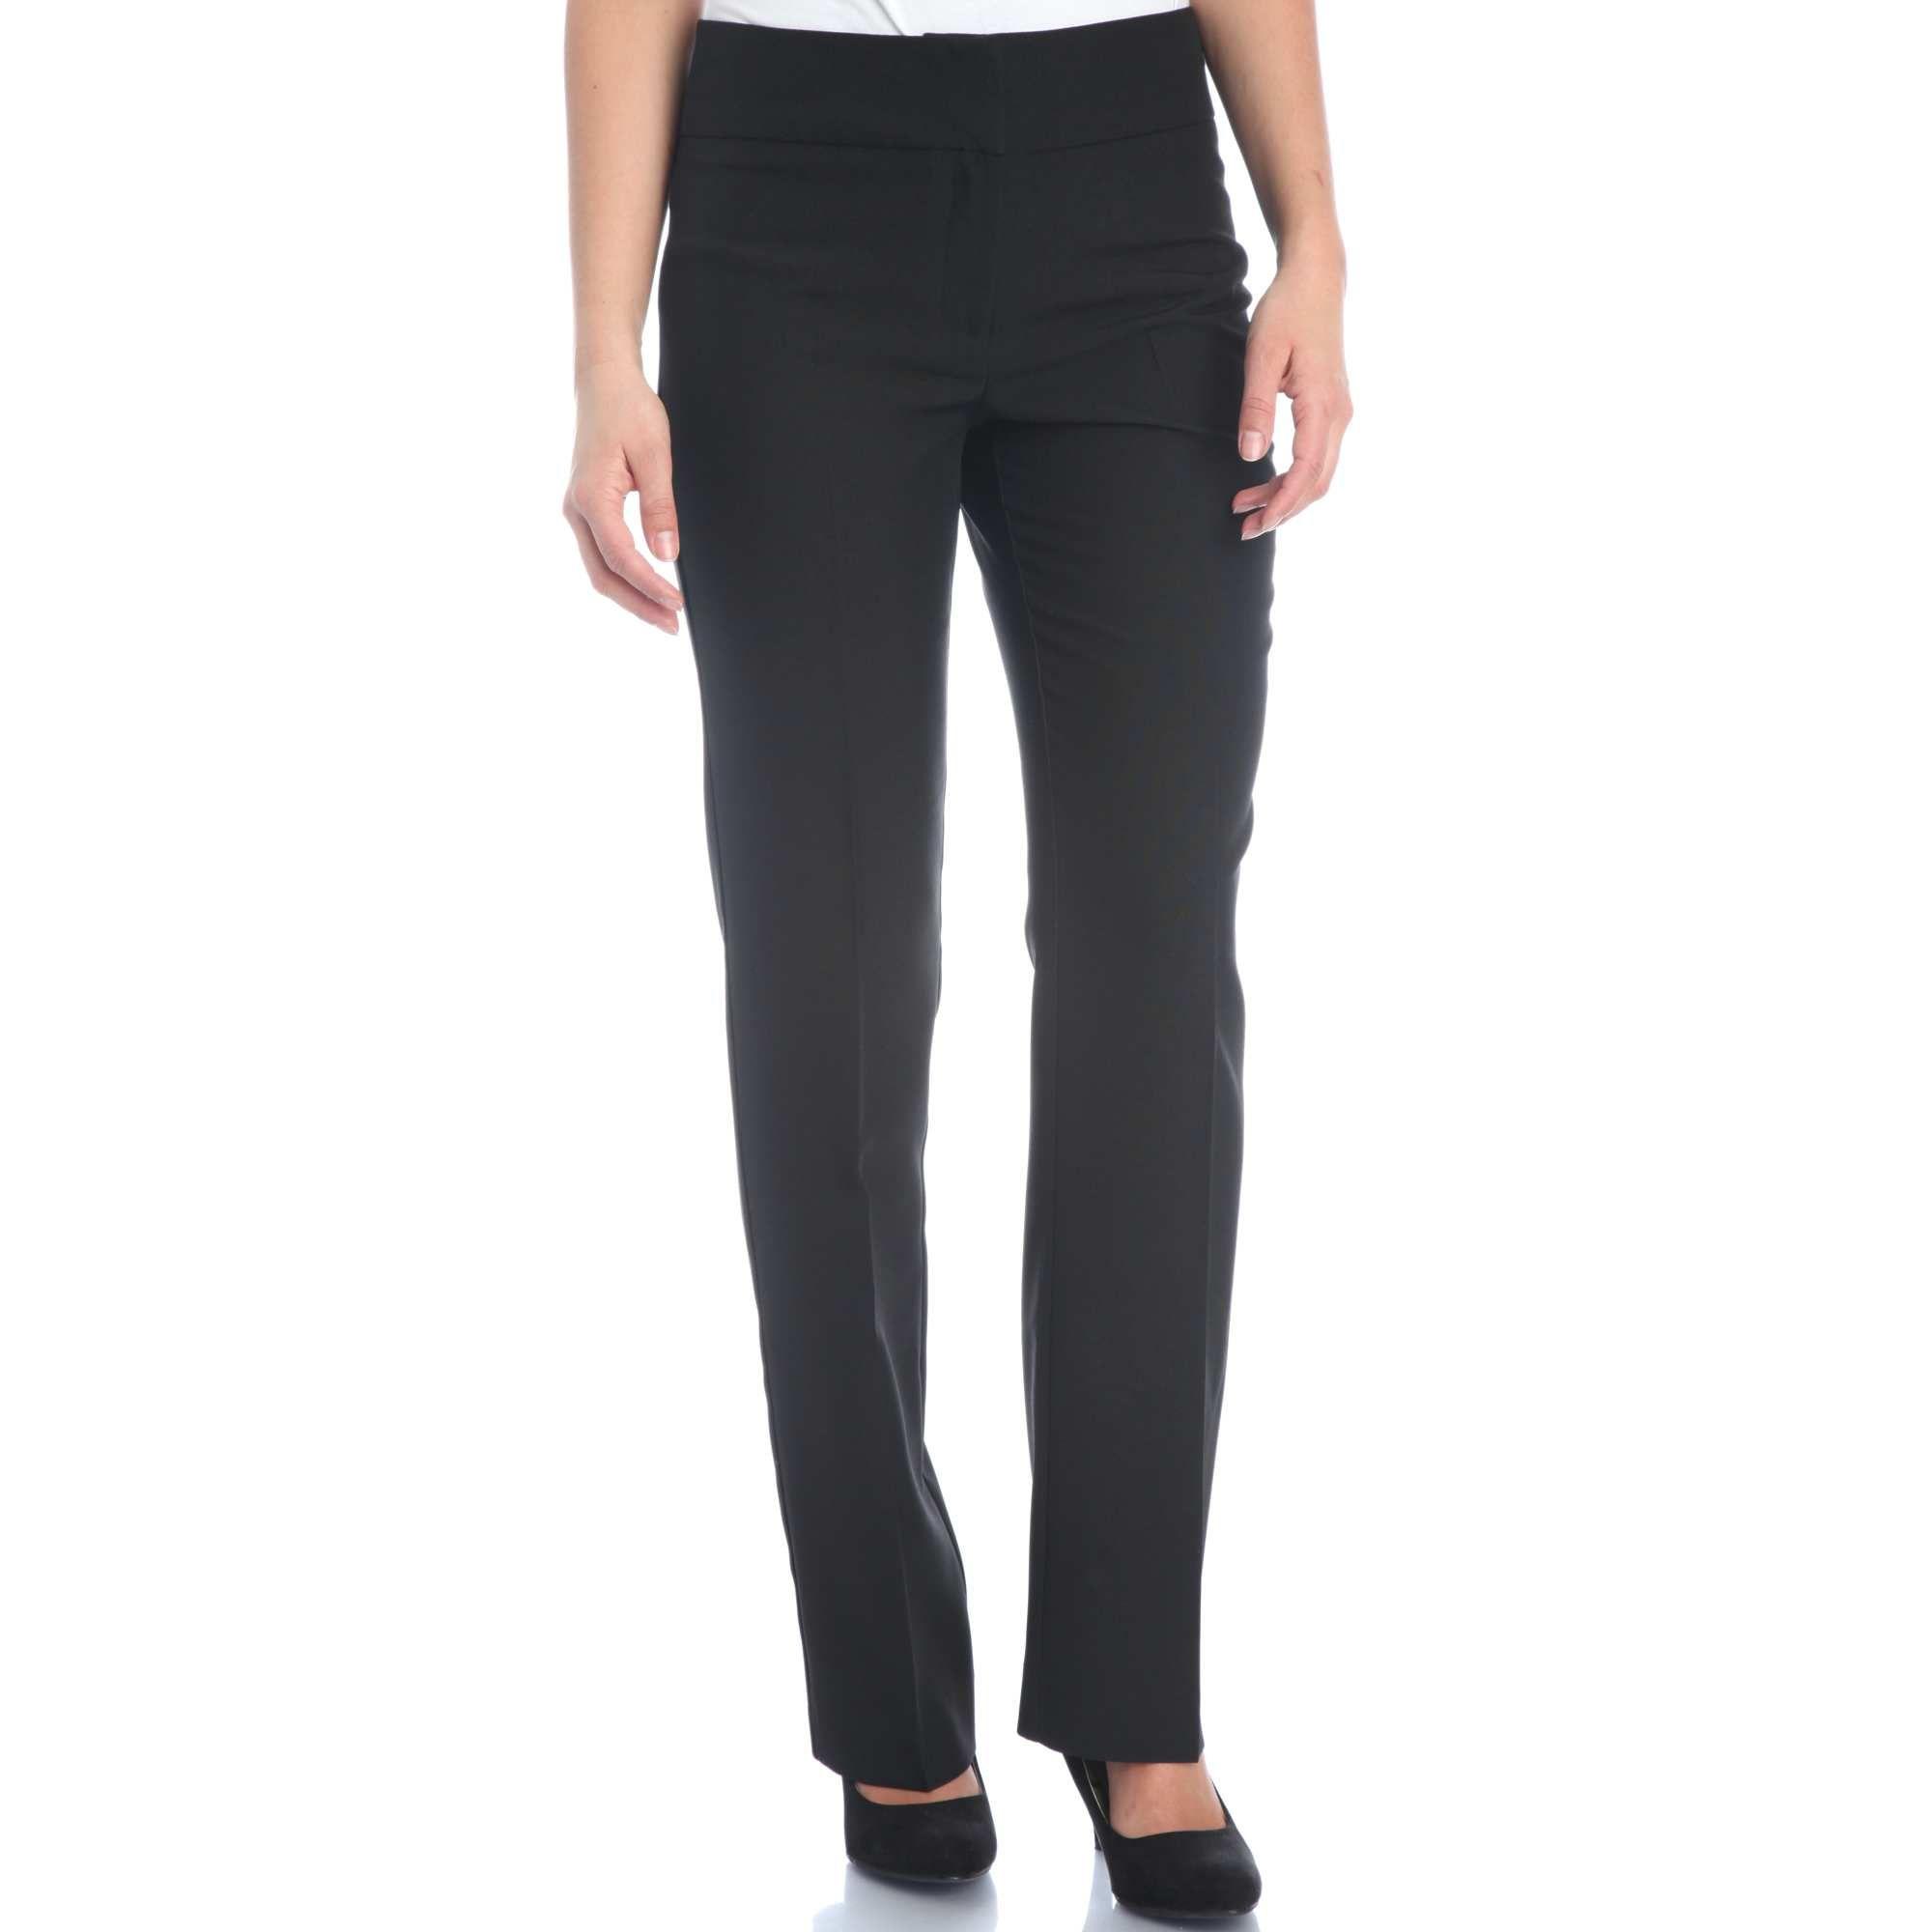 Pantalon De Vestir Stretch Mujer Kiabi 6 99 Pantsuit Suits Pants